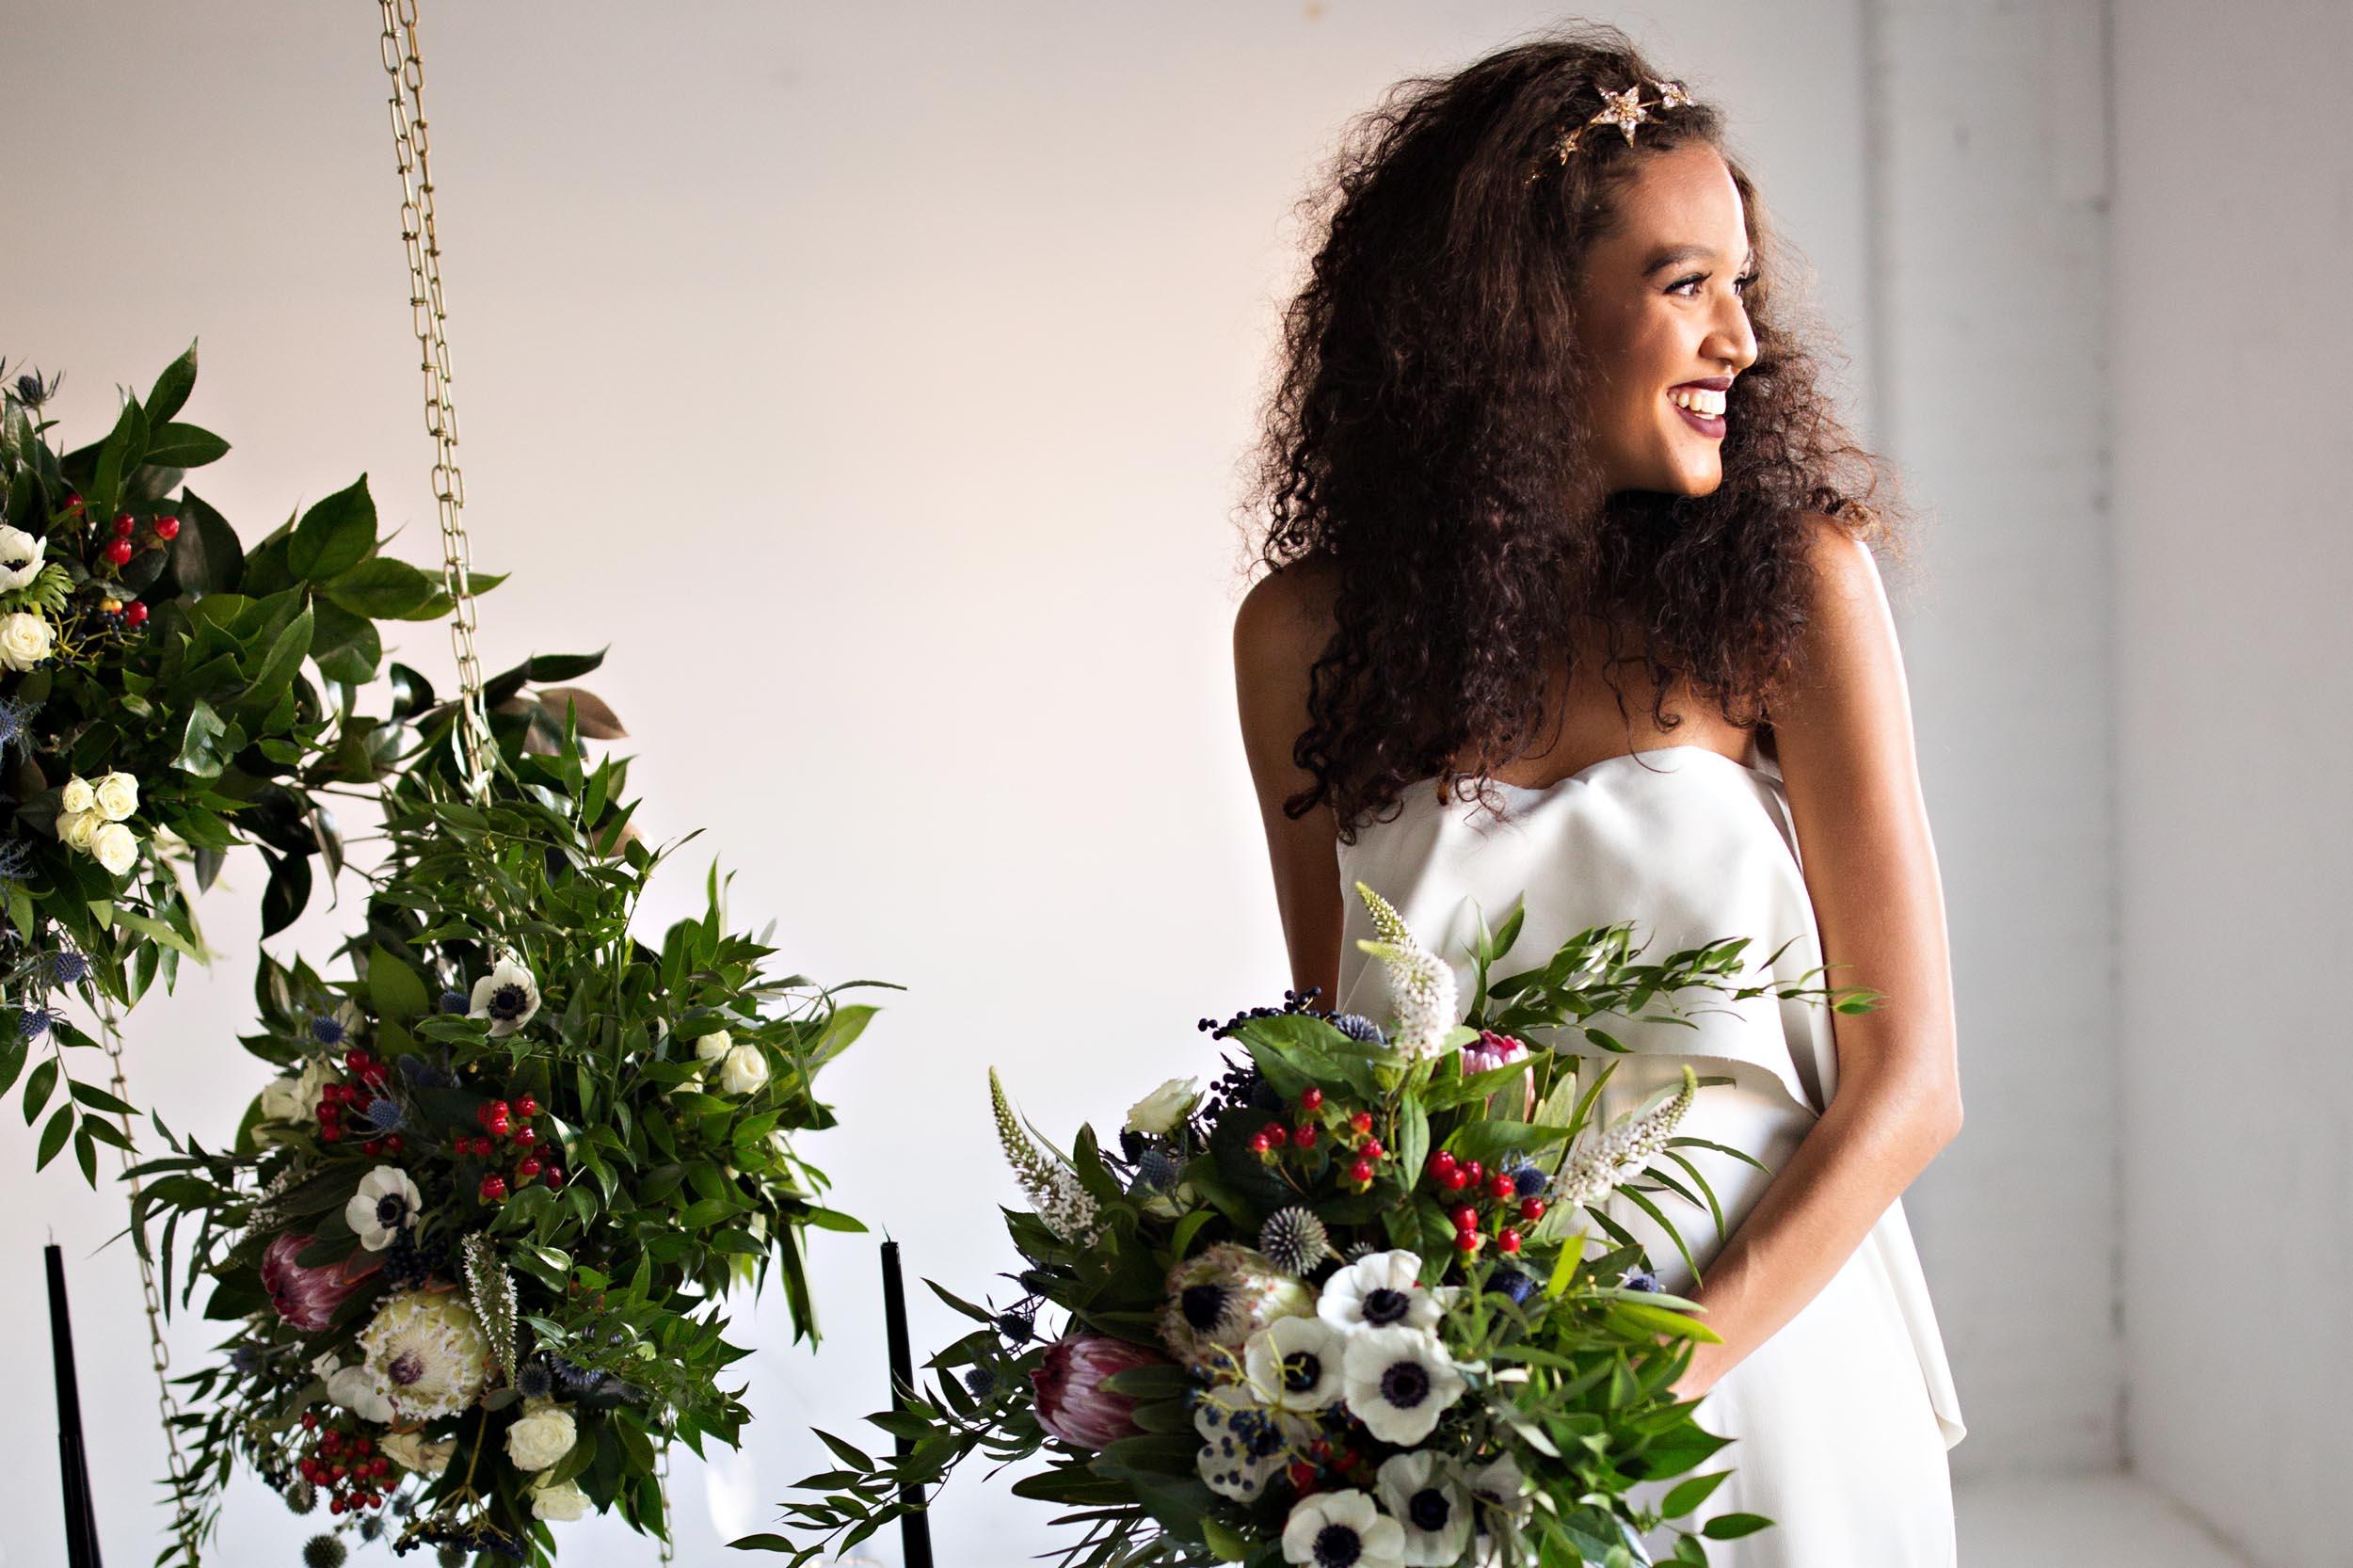 weddings-starsstripes-25.jpg